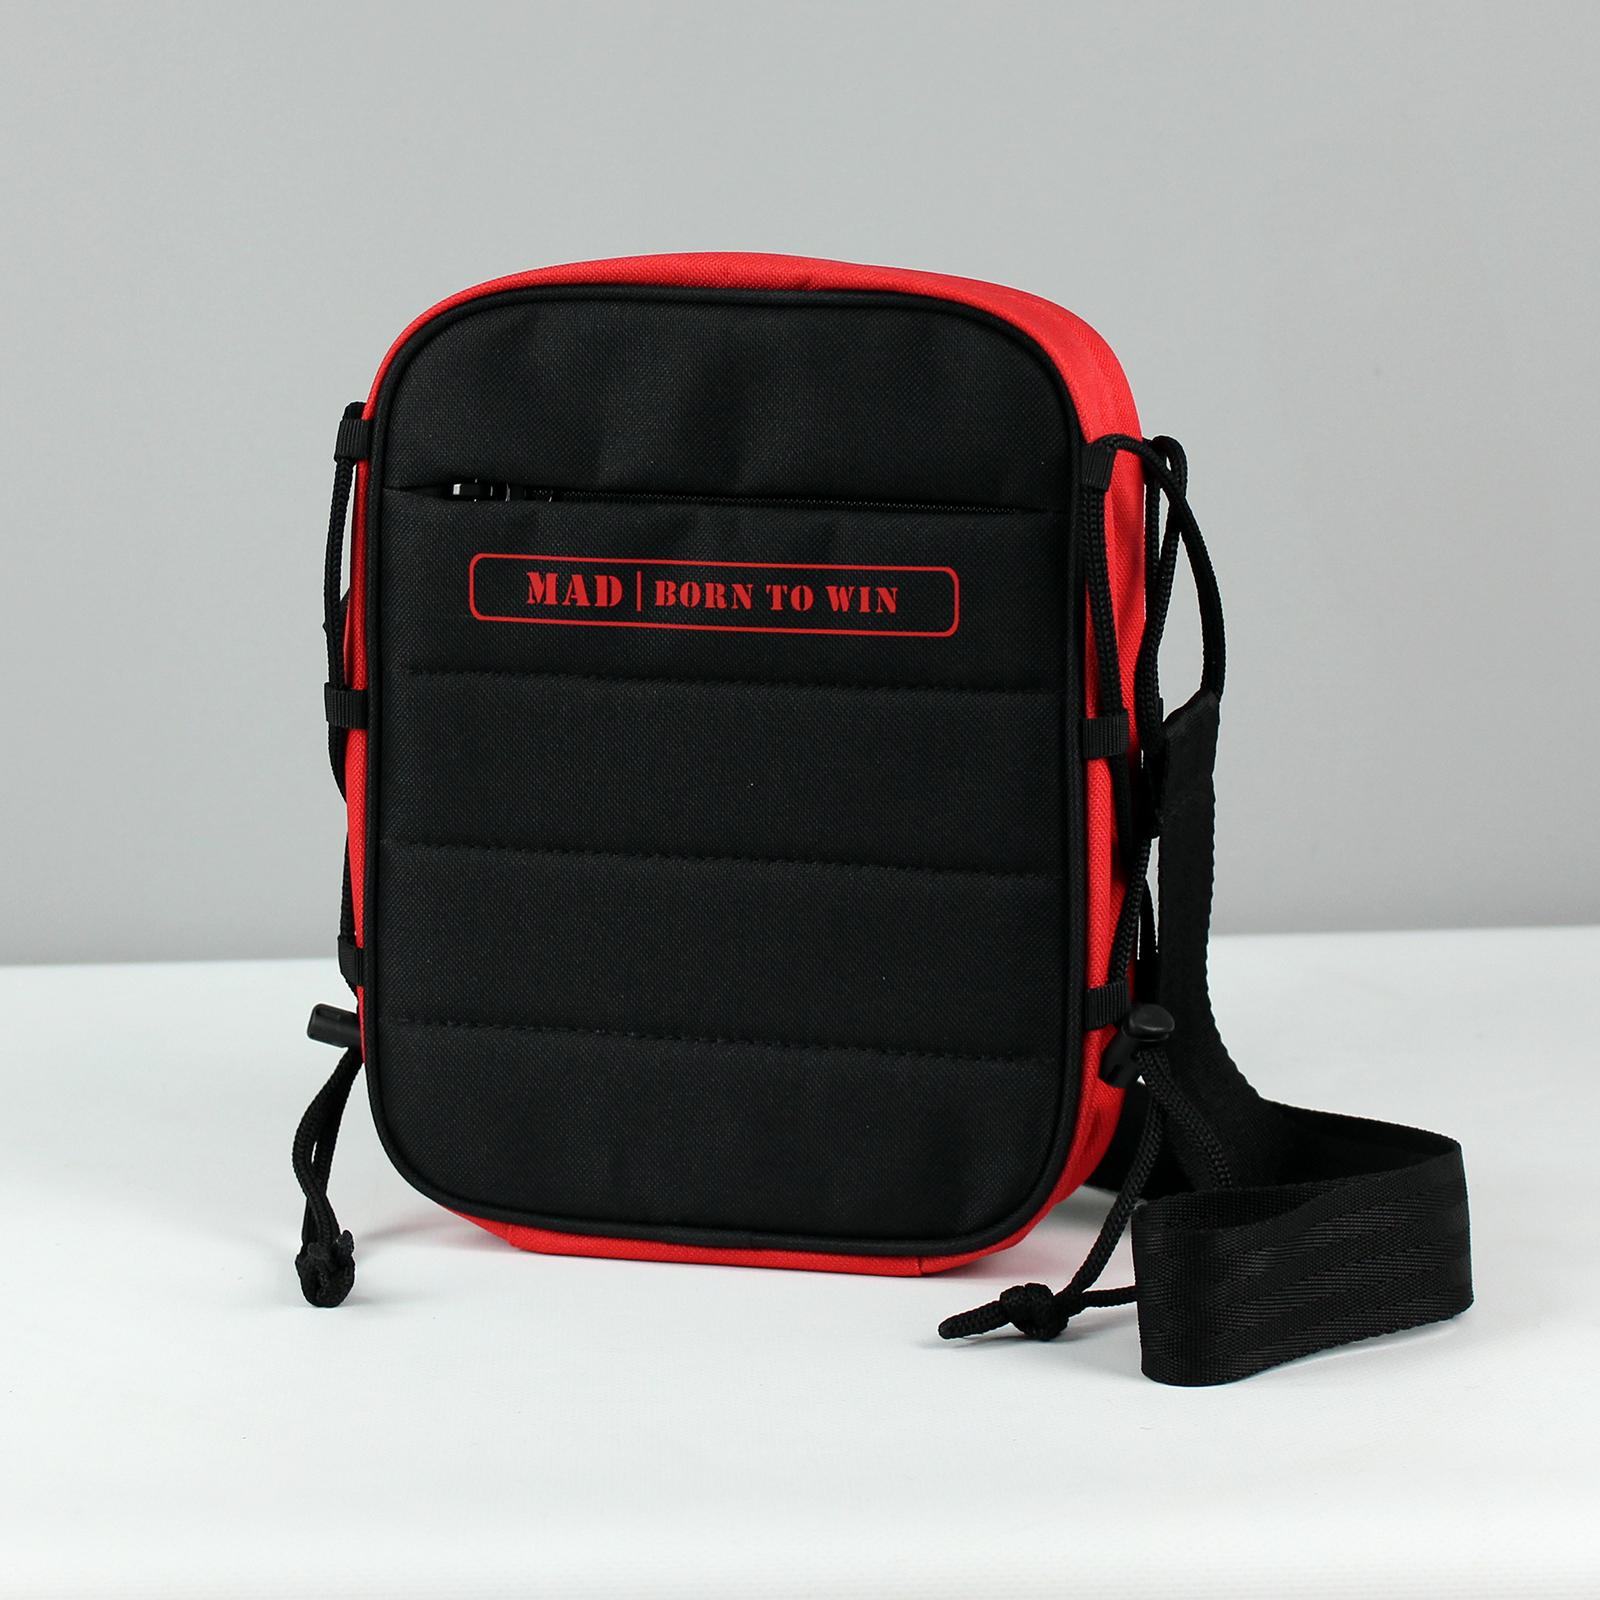 тканевая сумка на плечо, тканевые сумочки через плечо, сумки через плечо купить, сумочки через плечо, сумочка через плечо